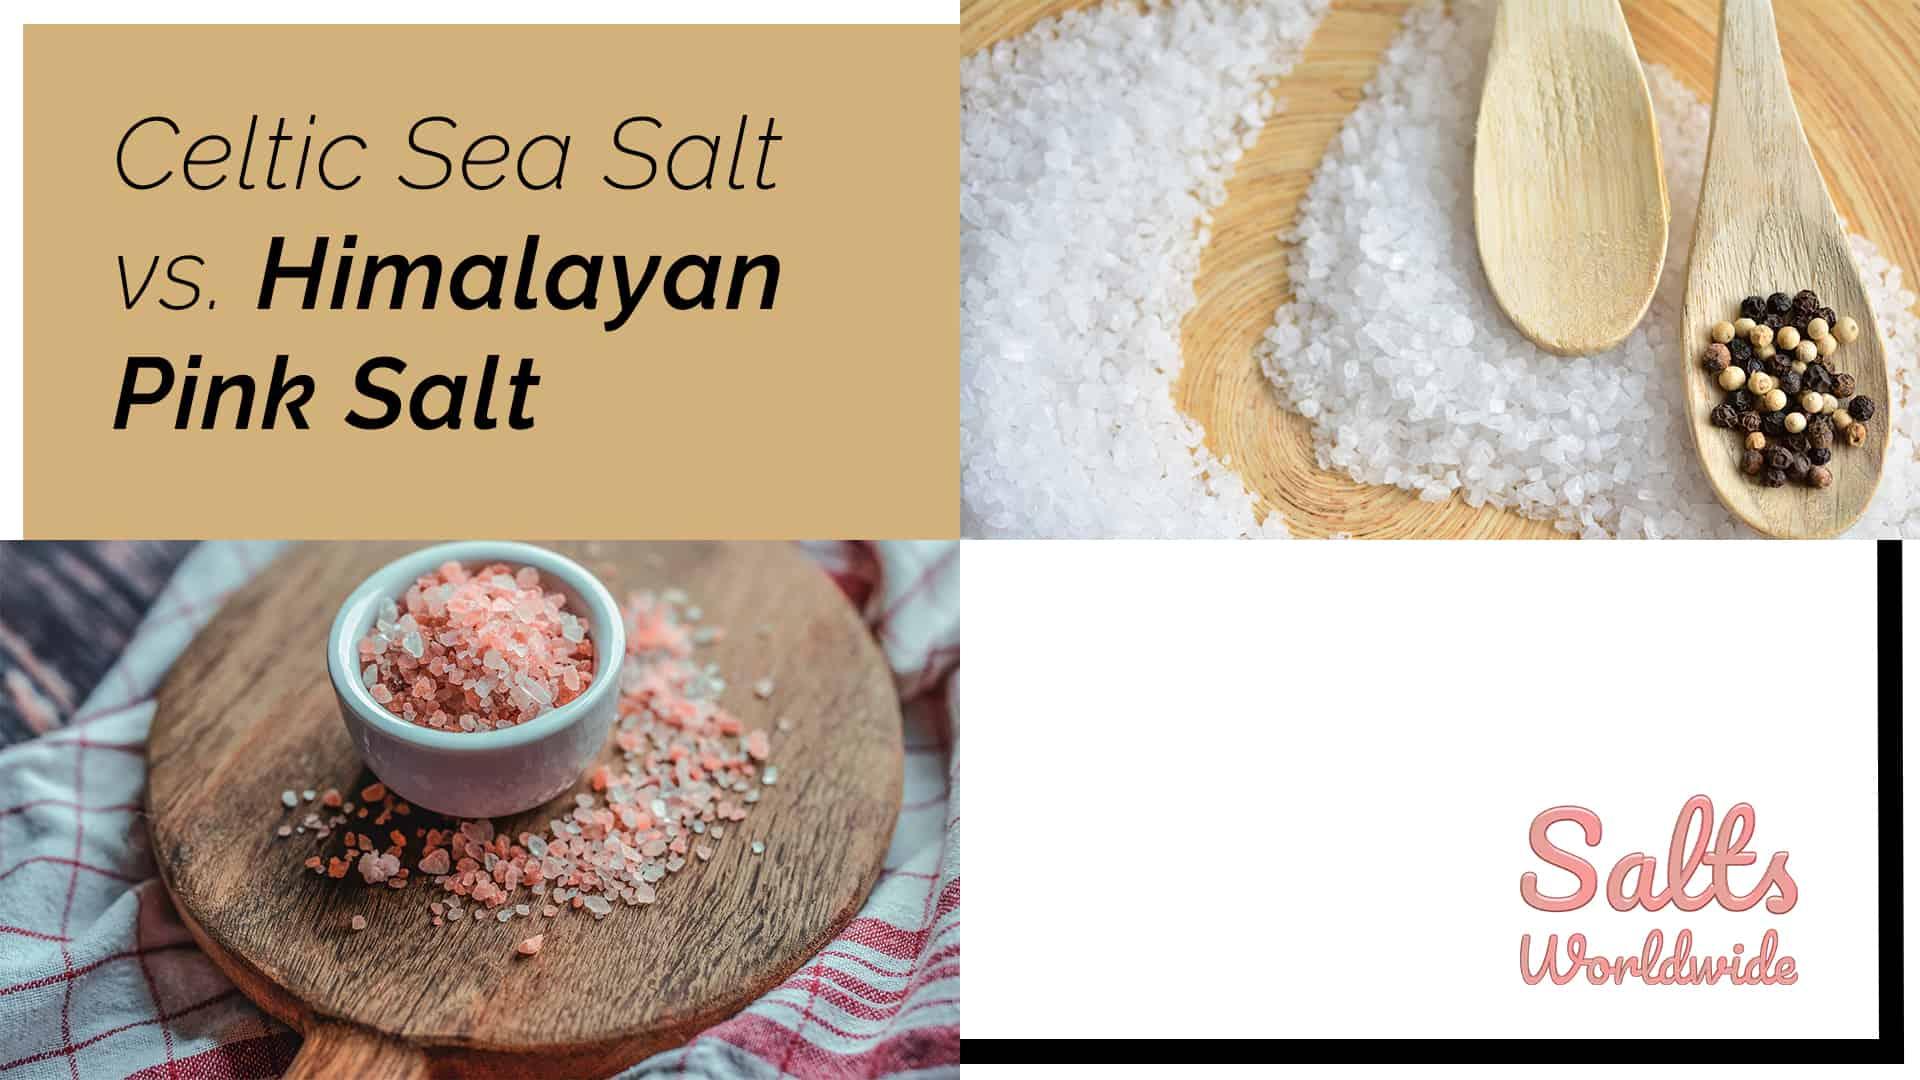 Celtic Sea Salt vs. Himalayan Pink Salt - featured image